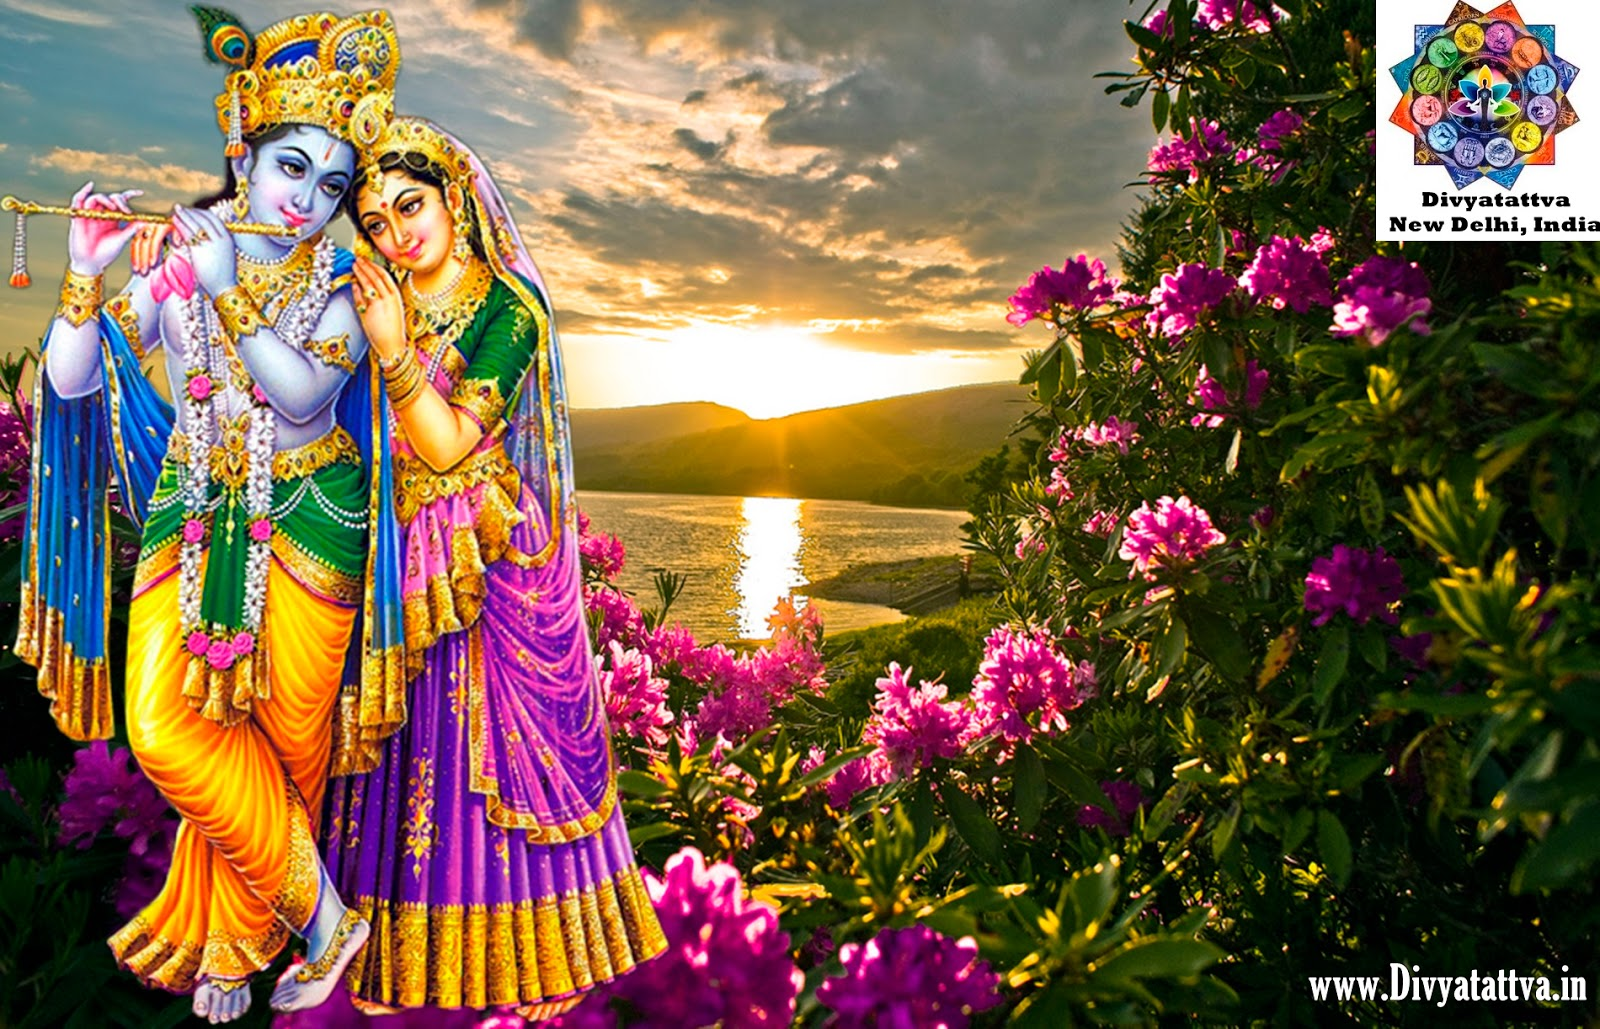 radha krishna hd images hindu god divine indian gods photos www.divyatattva.in